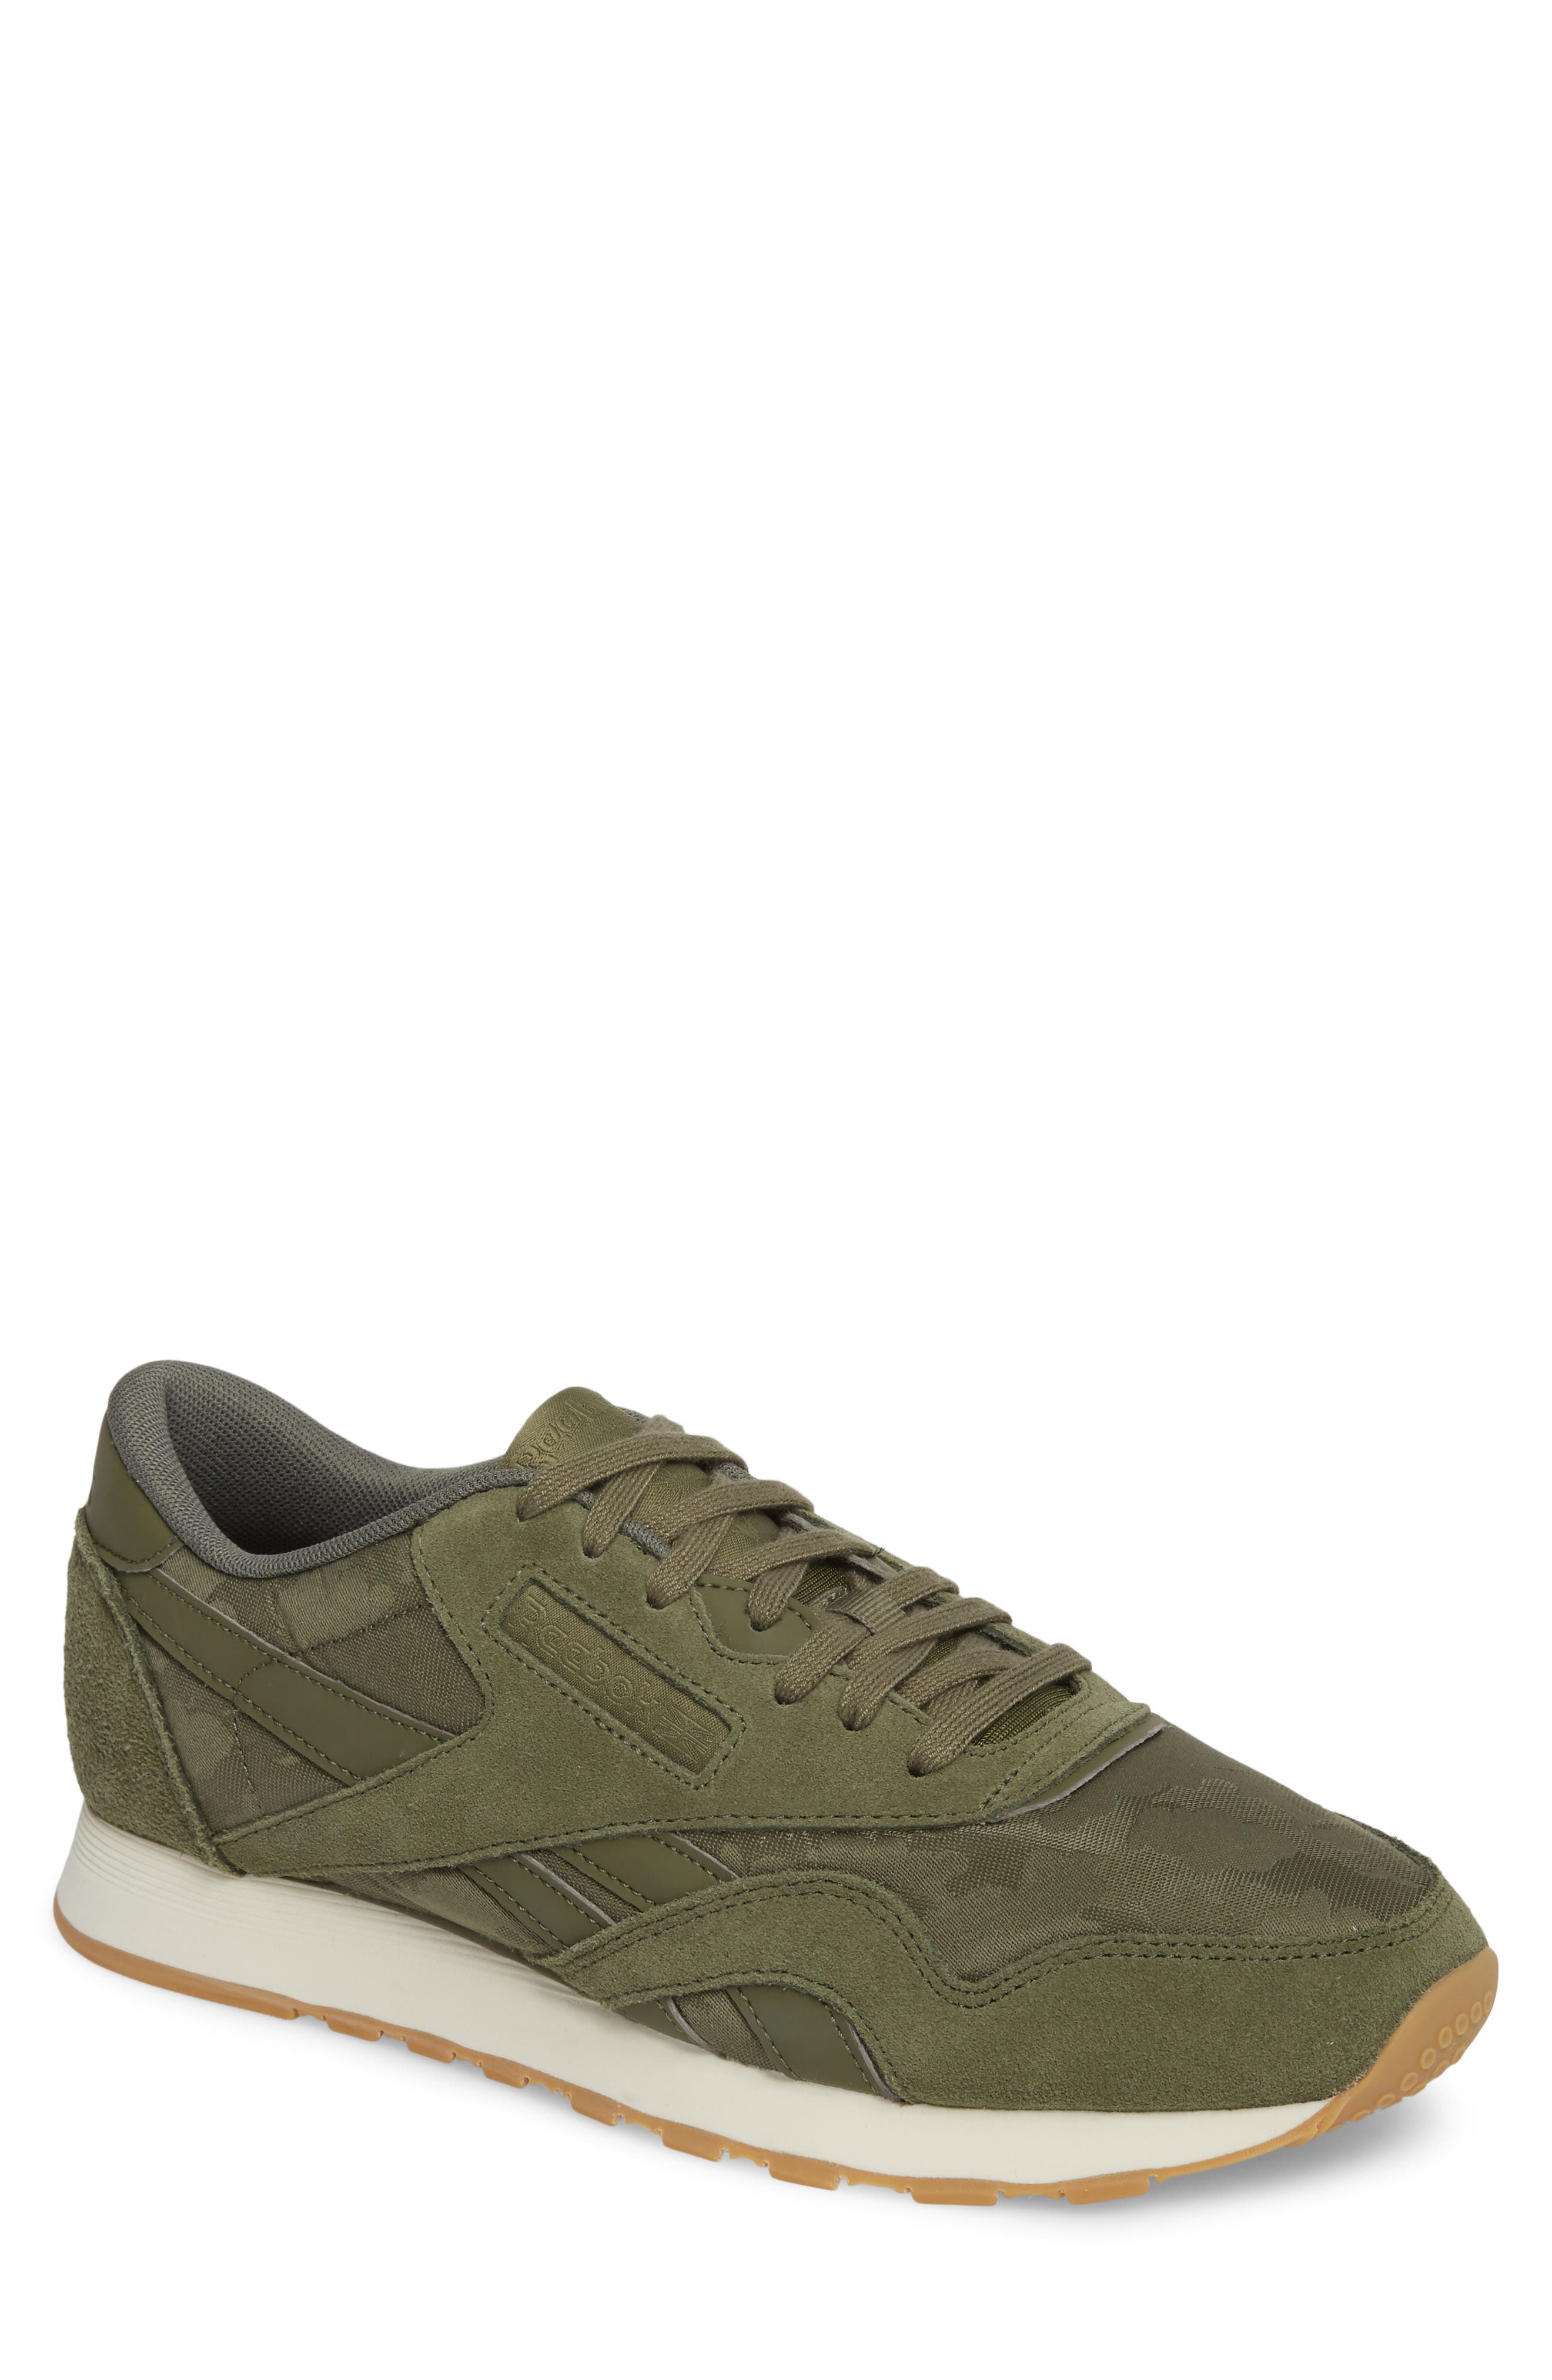 Reebok Classic Leather Nylon SG Sneaker (Men)